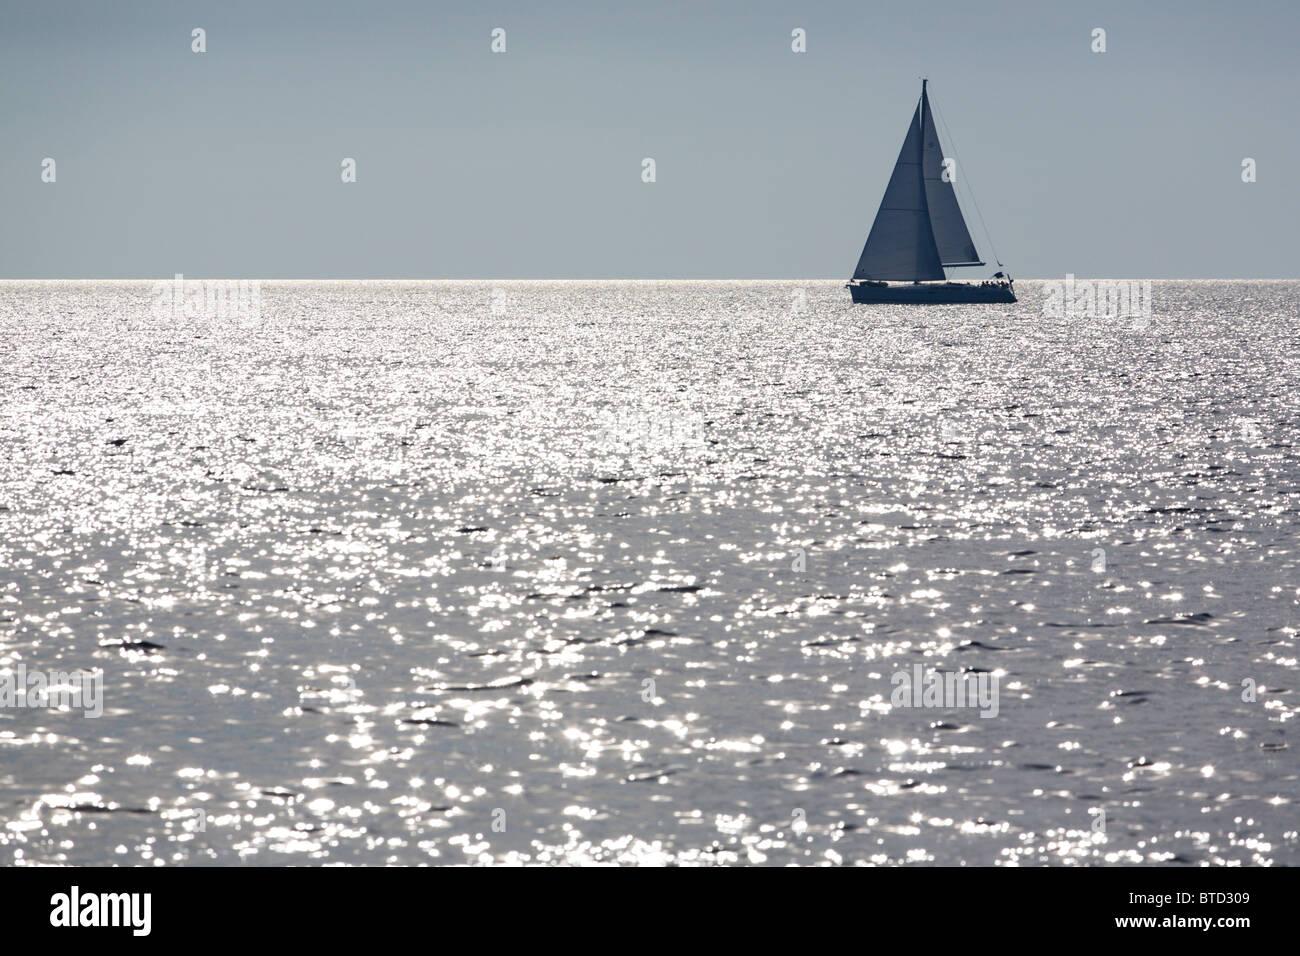 Lone yacht - Stock Image